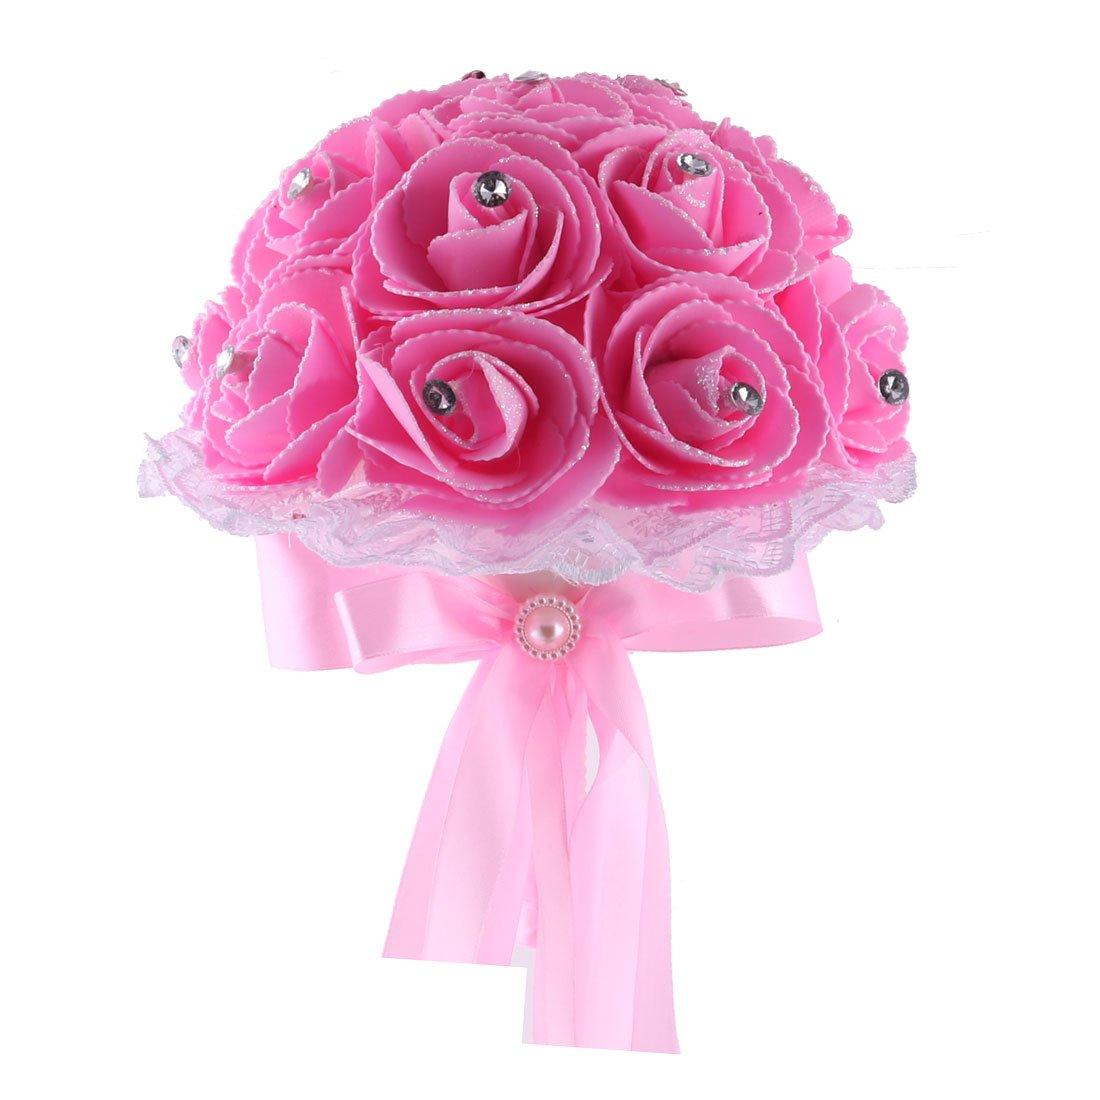 uxcell Foam Rose Buds Wedding Banquet Bridal Handhold Artificial Bouquet Craft Ornament Pink a17041800ux0227